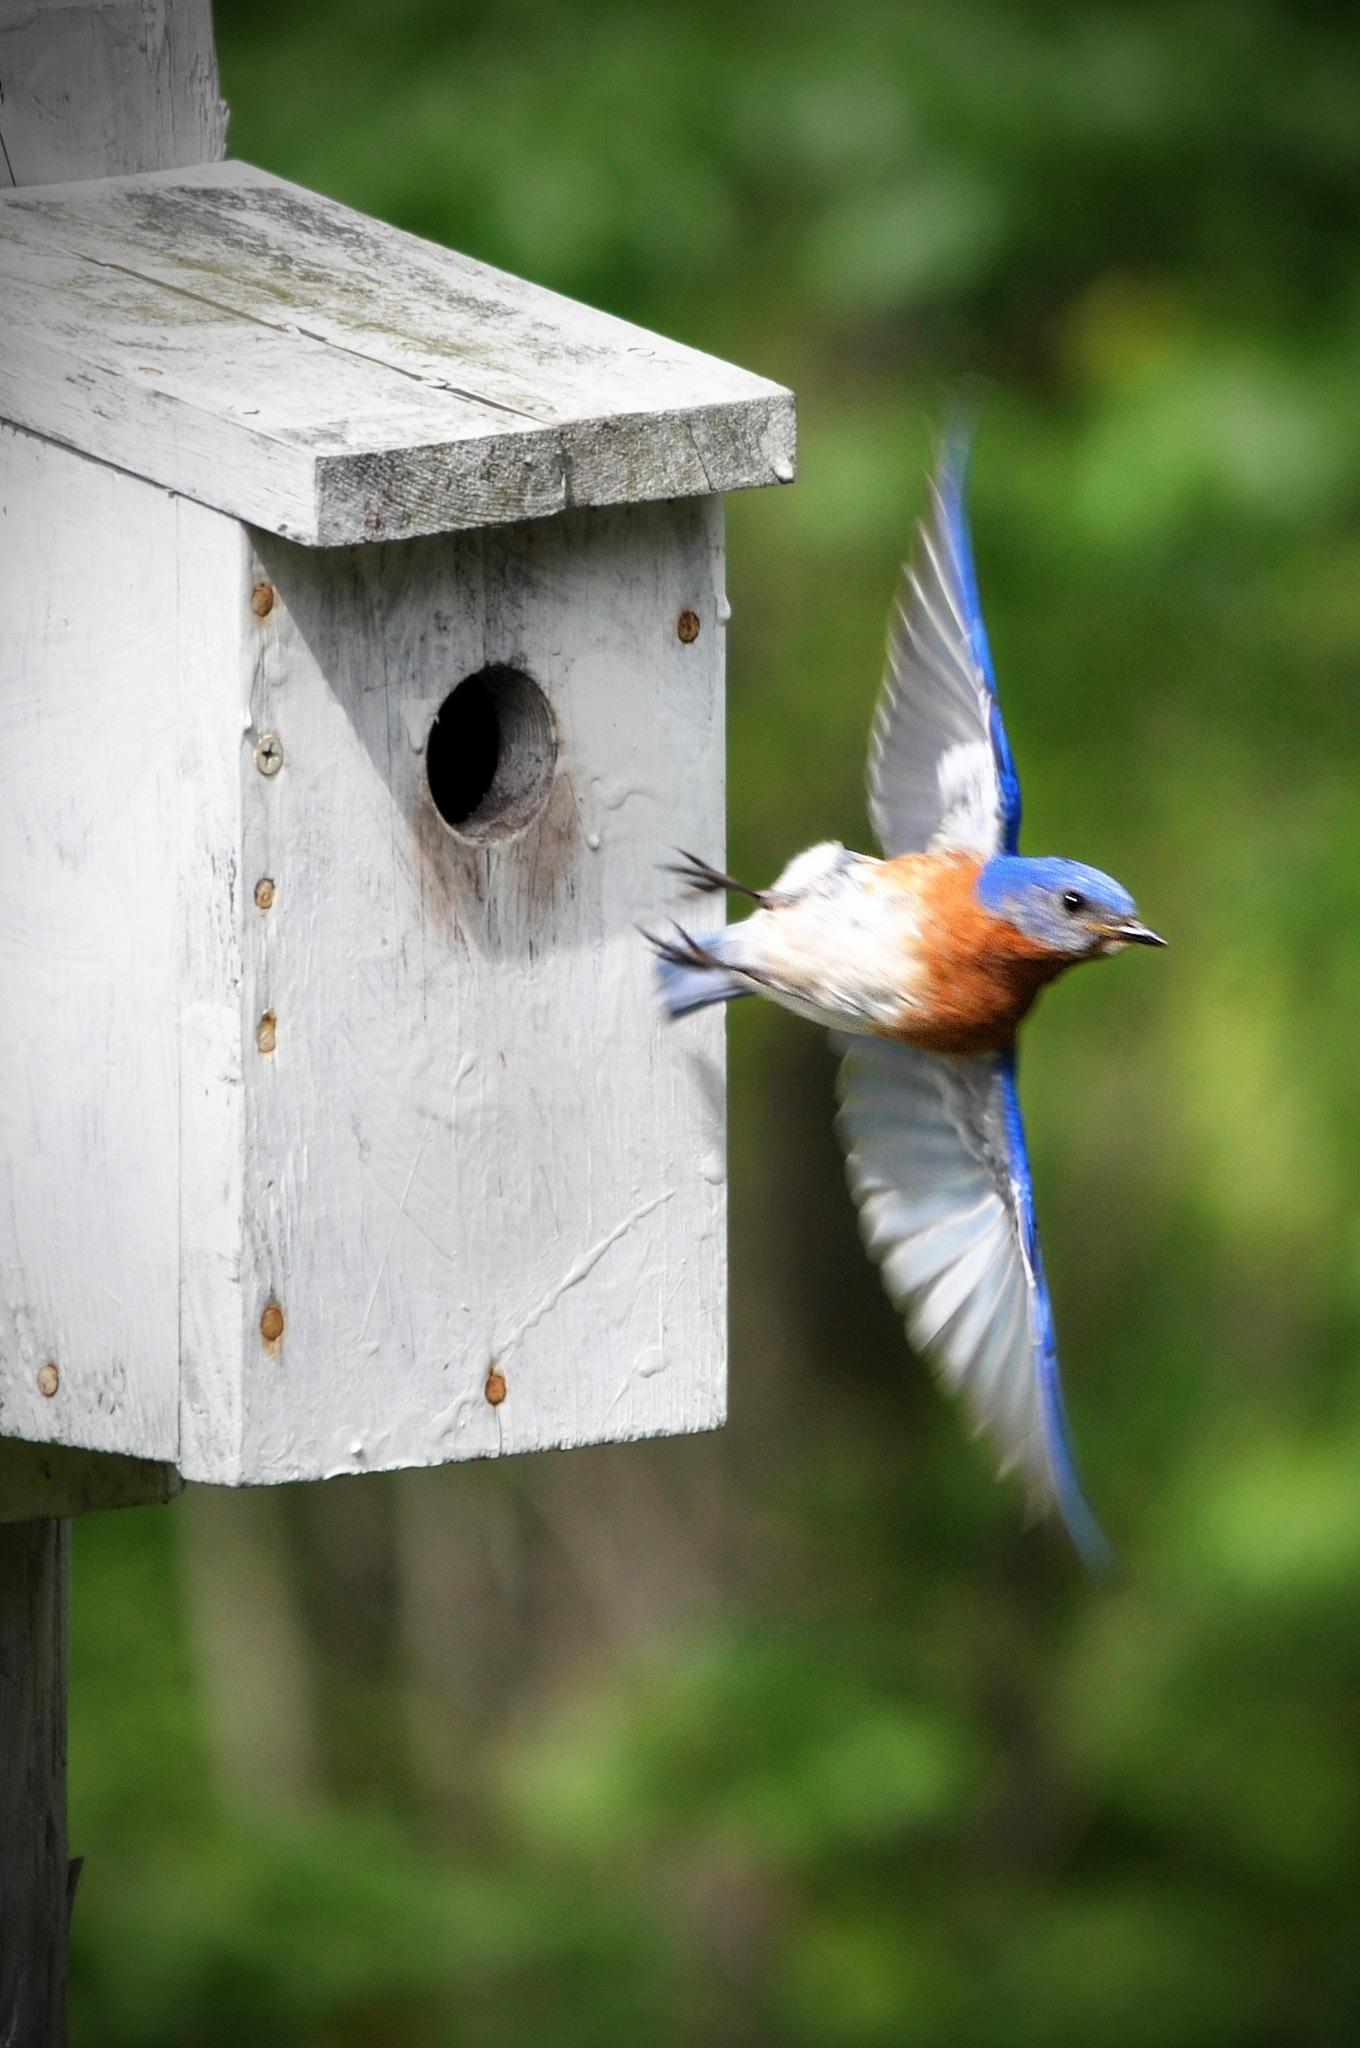 Bluebird taking flight by KevinMorganDesigns